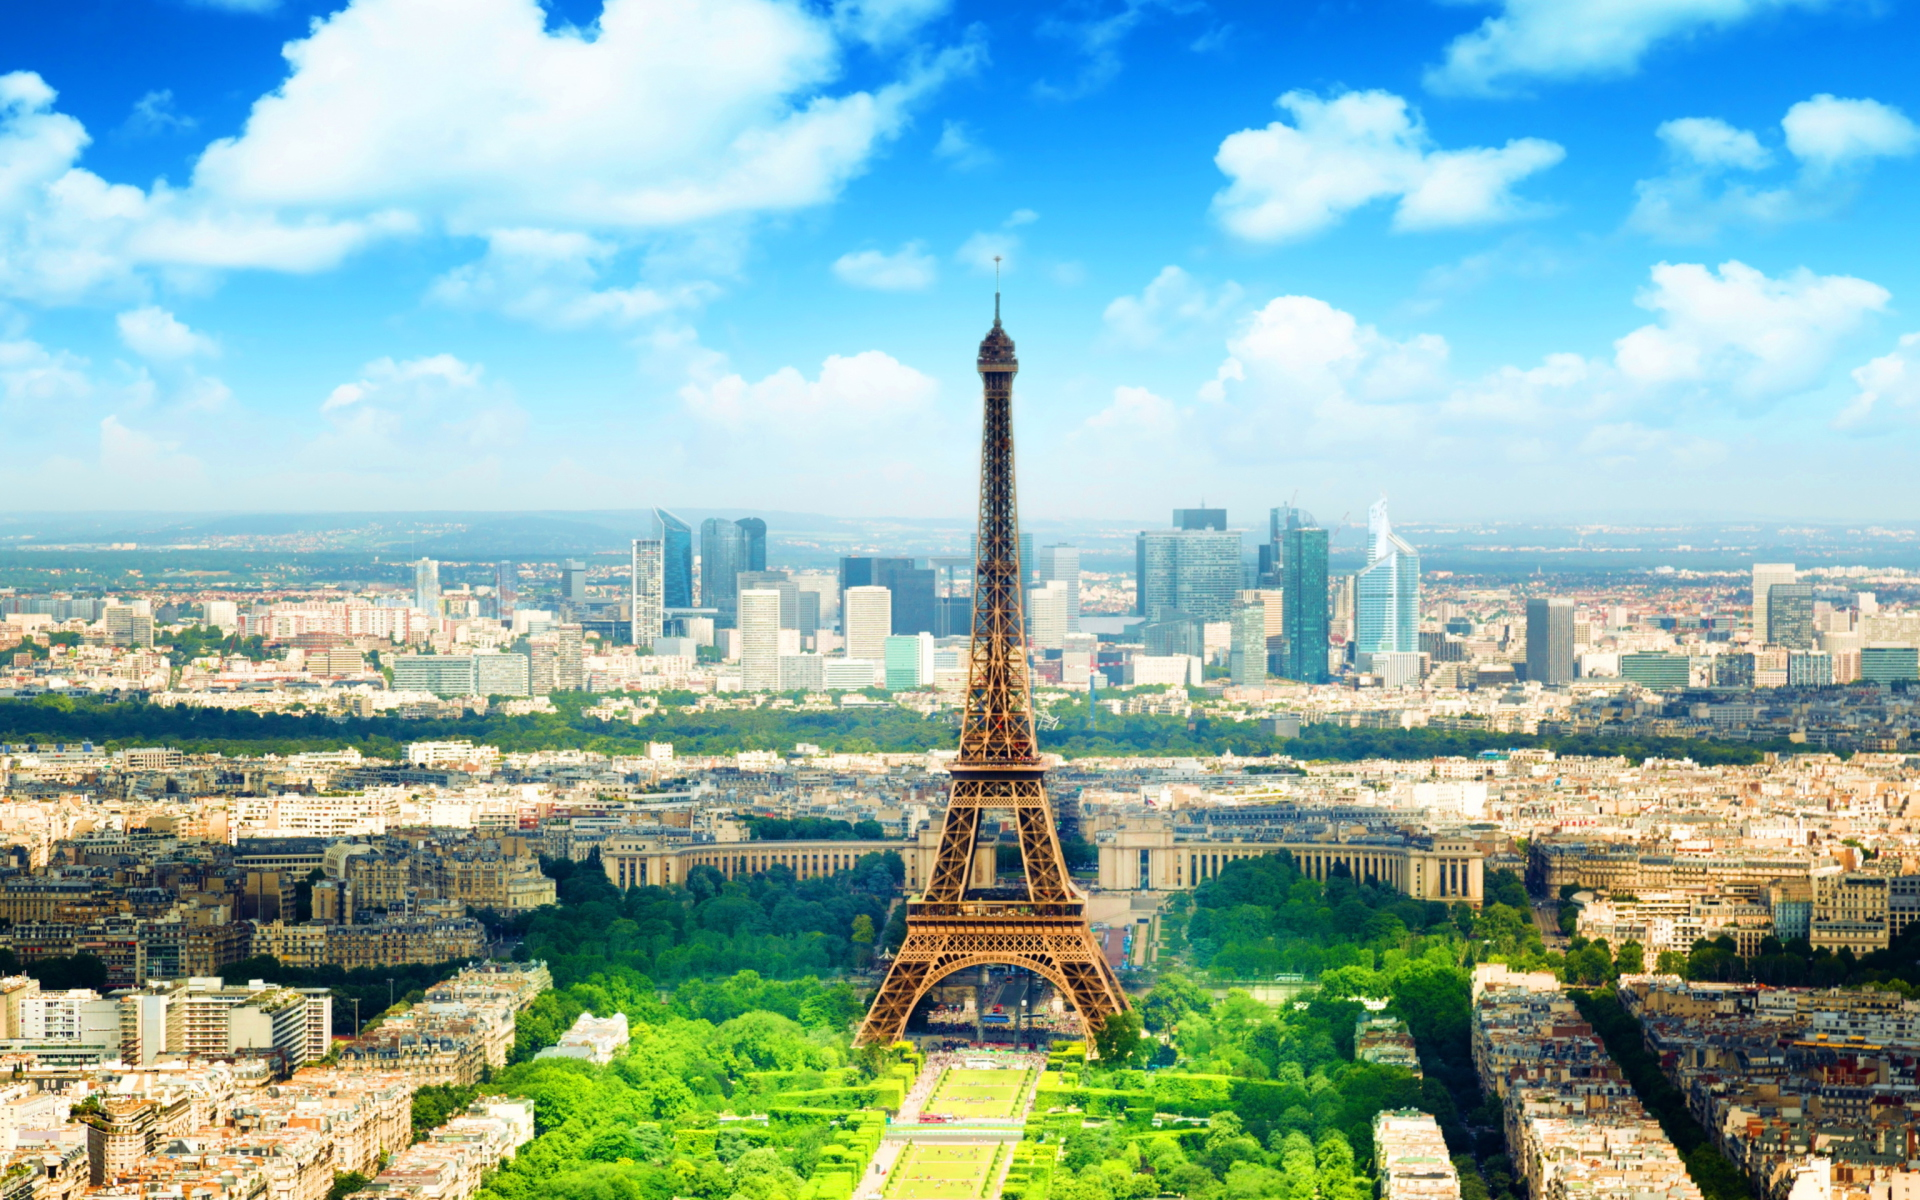 Paris In Summer para Widescreen Desktop PC 1920x1080 Full HD